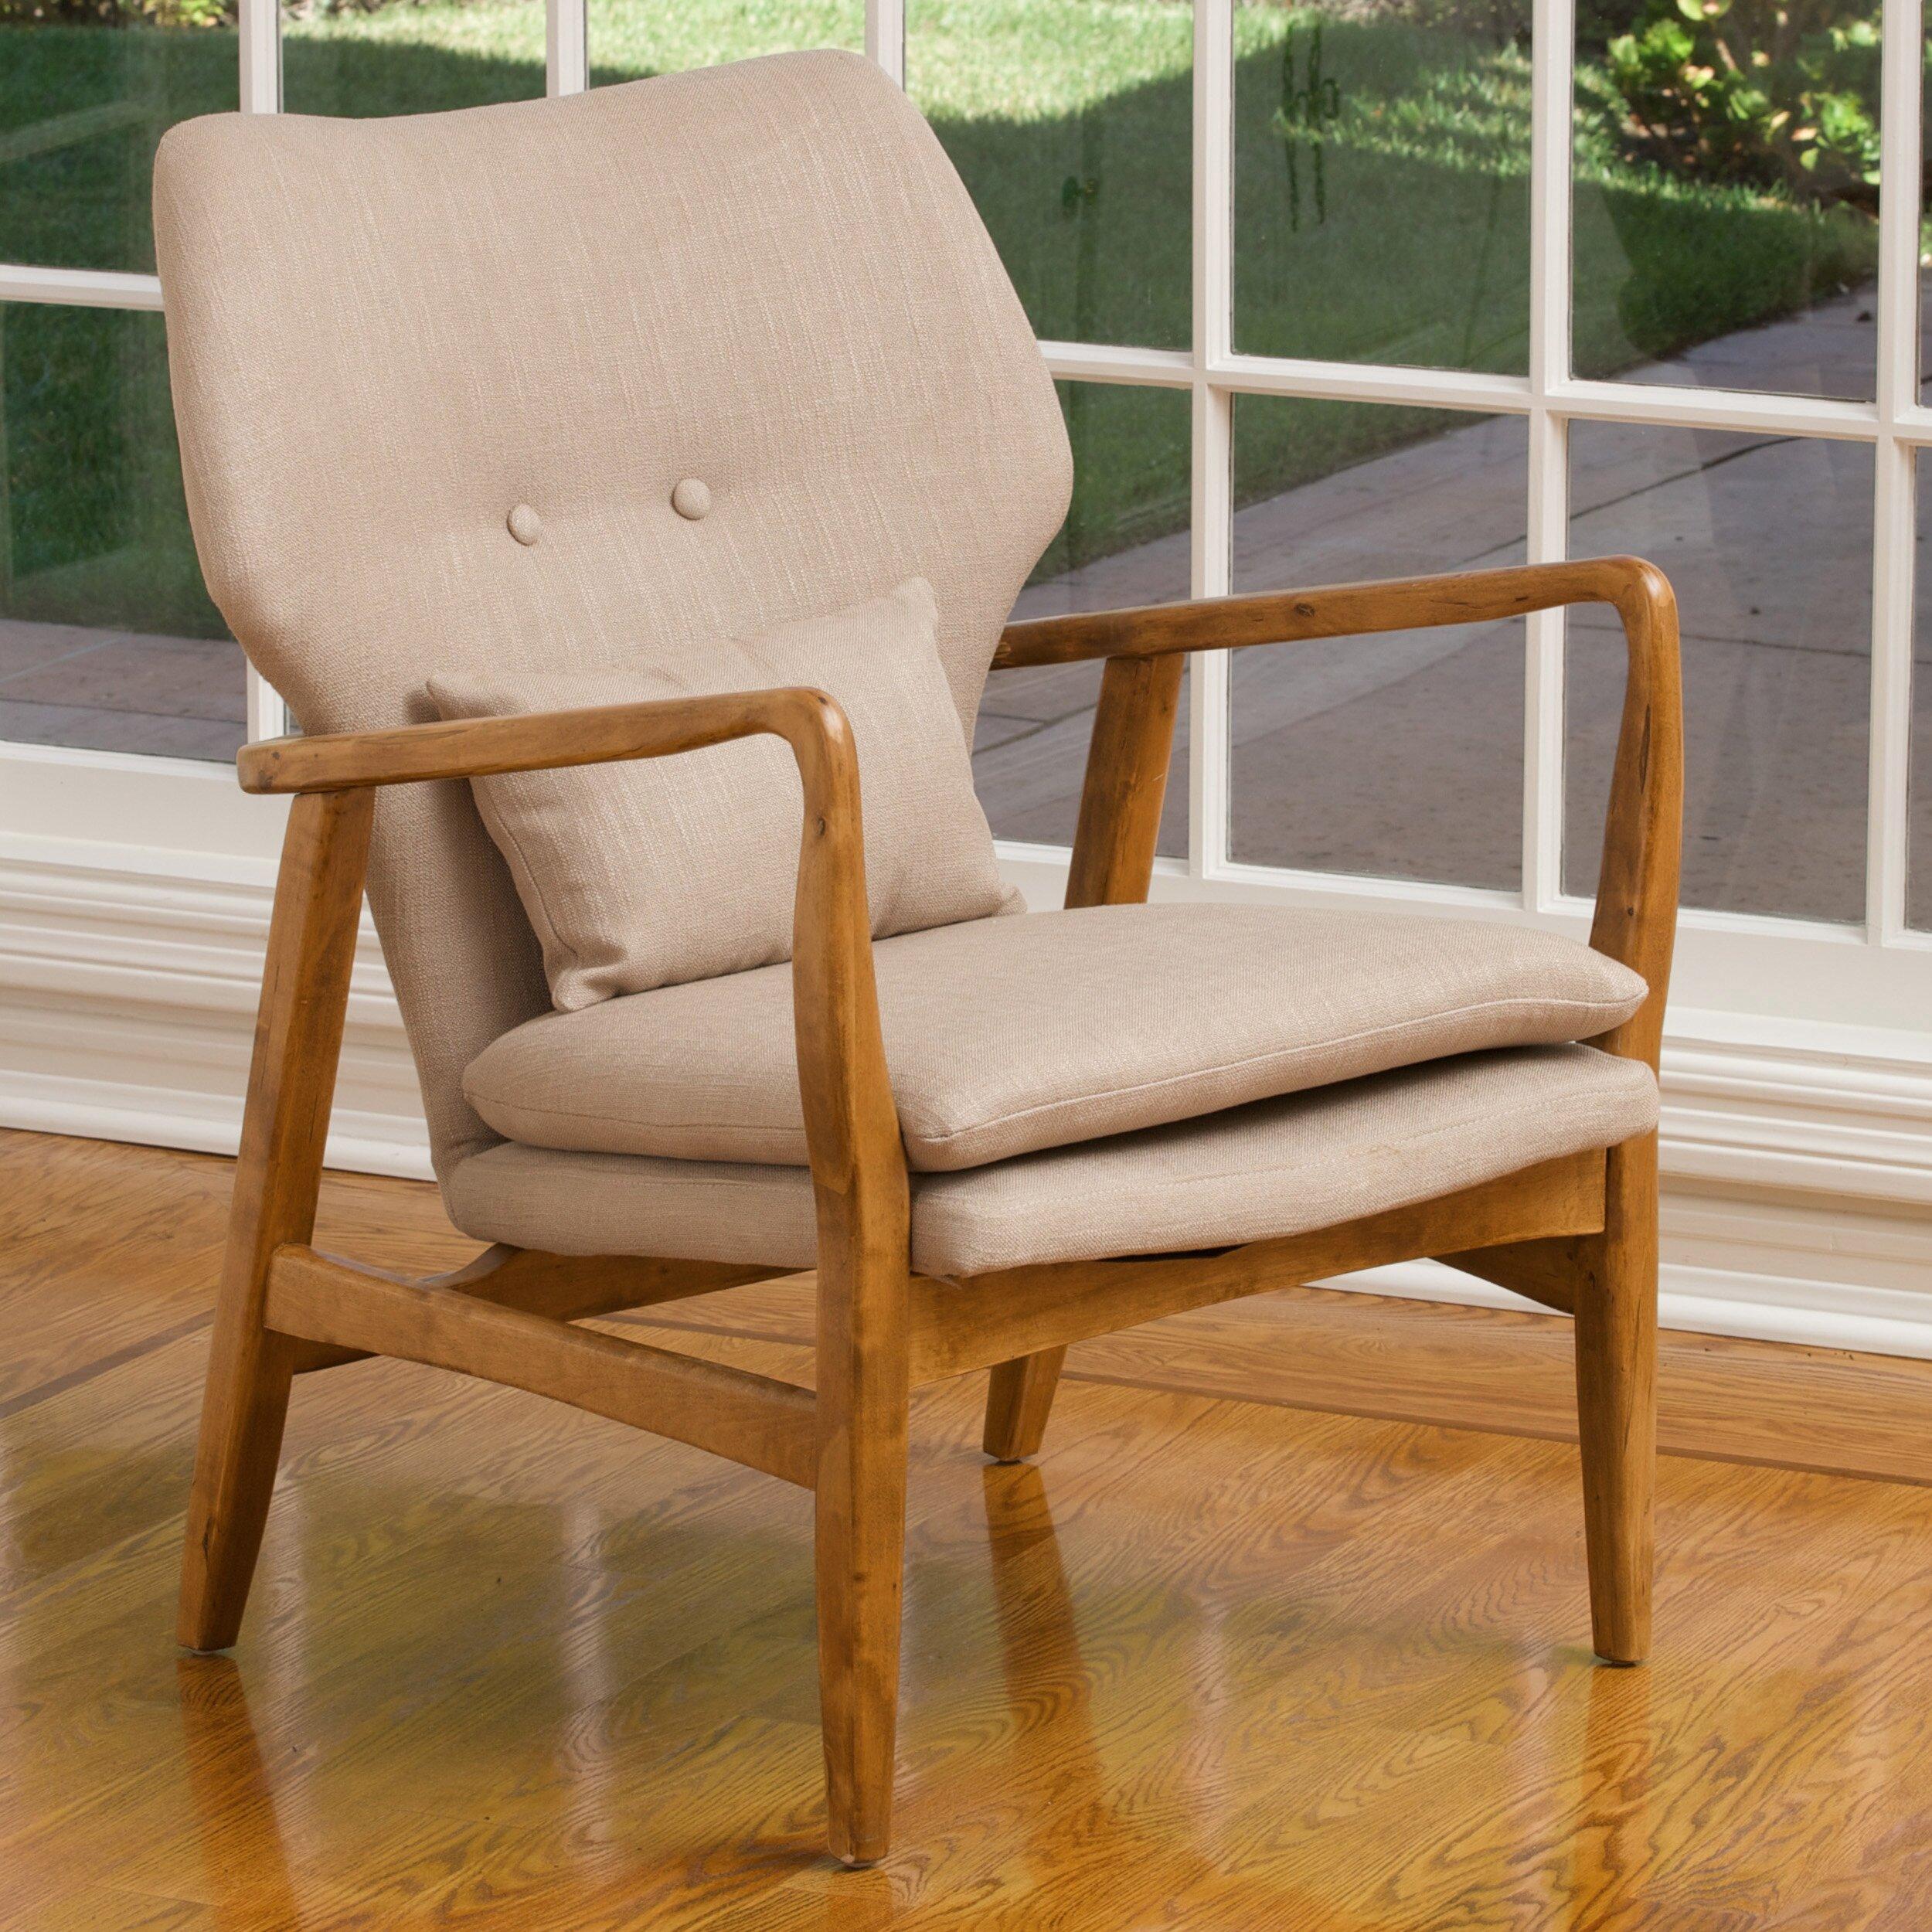 Home Loft Concepts Isabella Accent Arm Chair. Home Loft Concepts Isabella Accent Arm Chair   Reviews   Wayfair